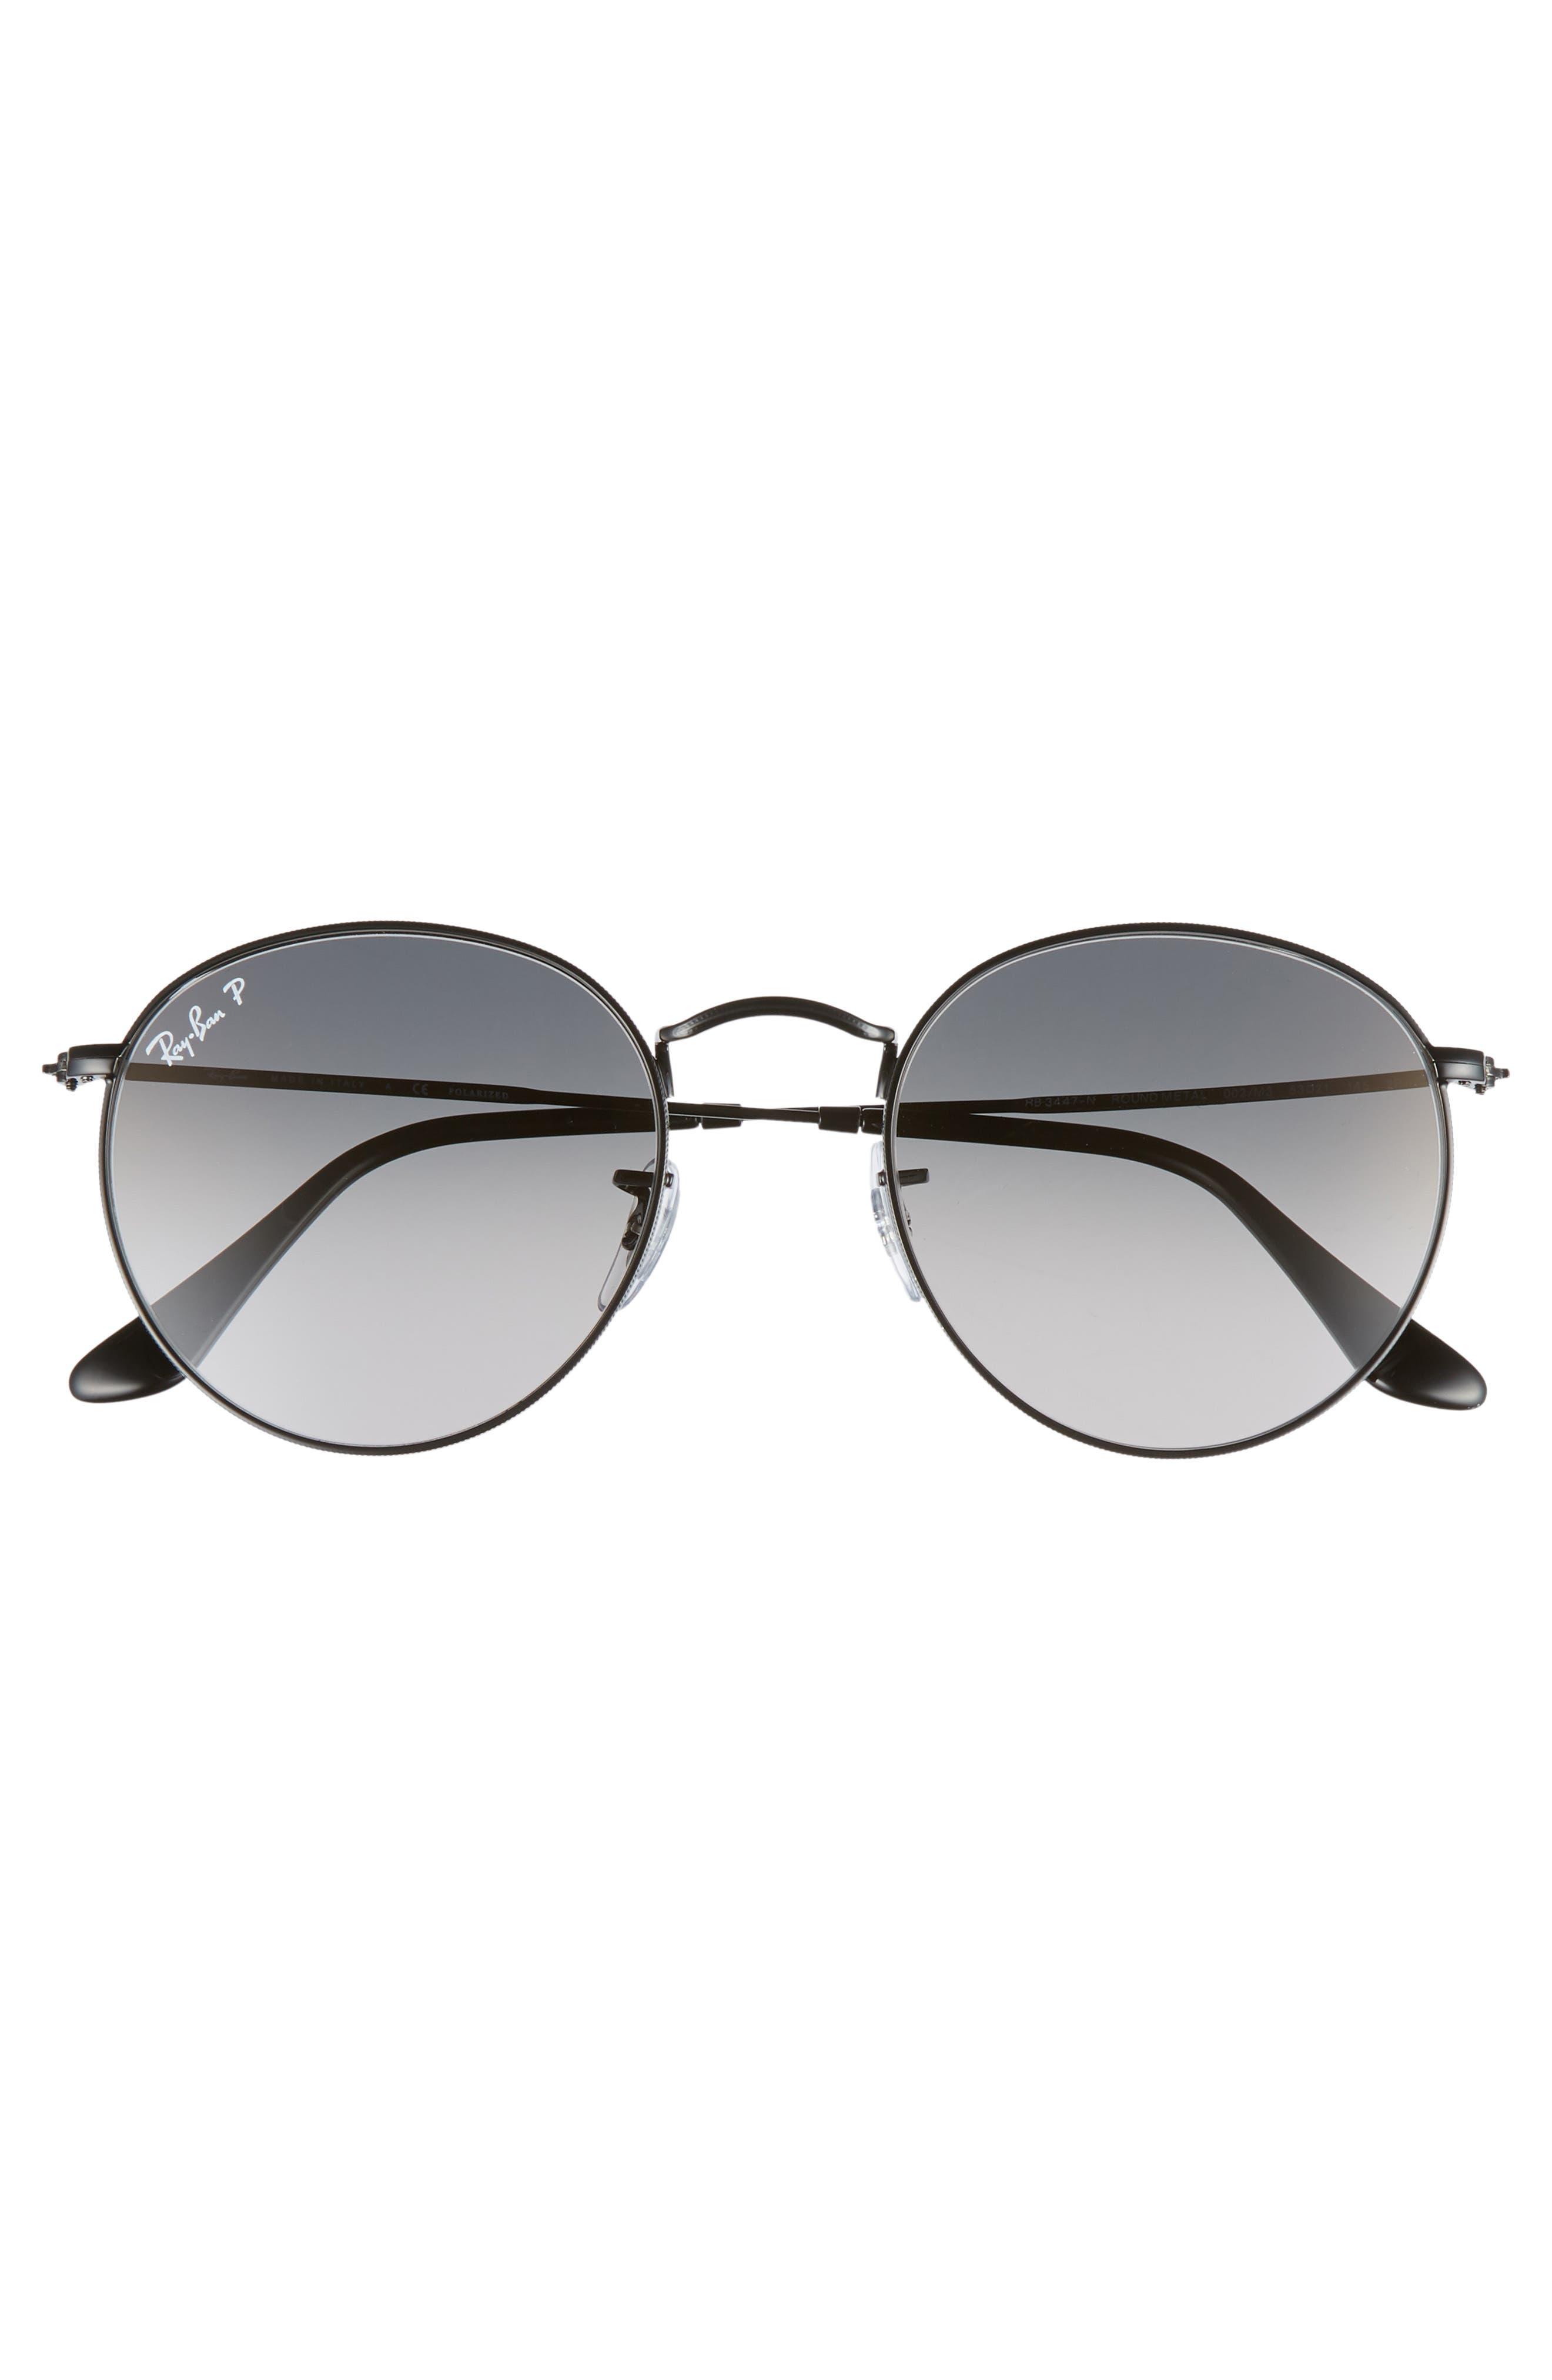 53mm Polarized Round Sunglasses,                             Alternate thumbnail 2, color,                             BLACK / GREY